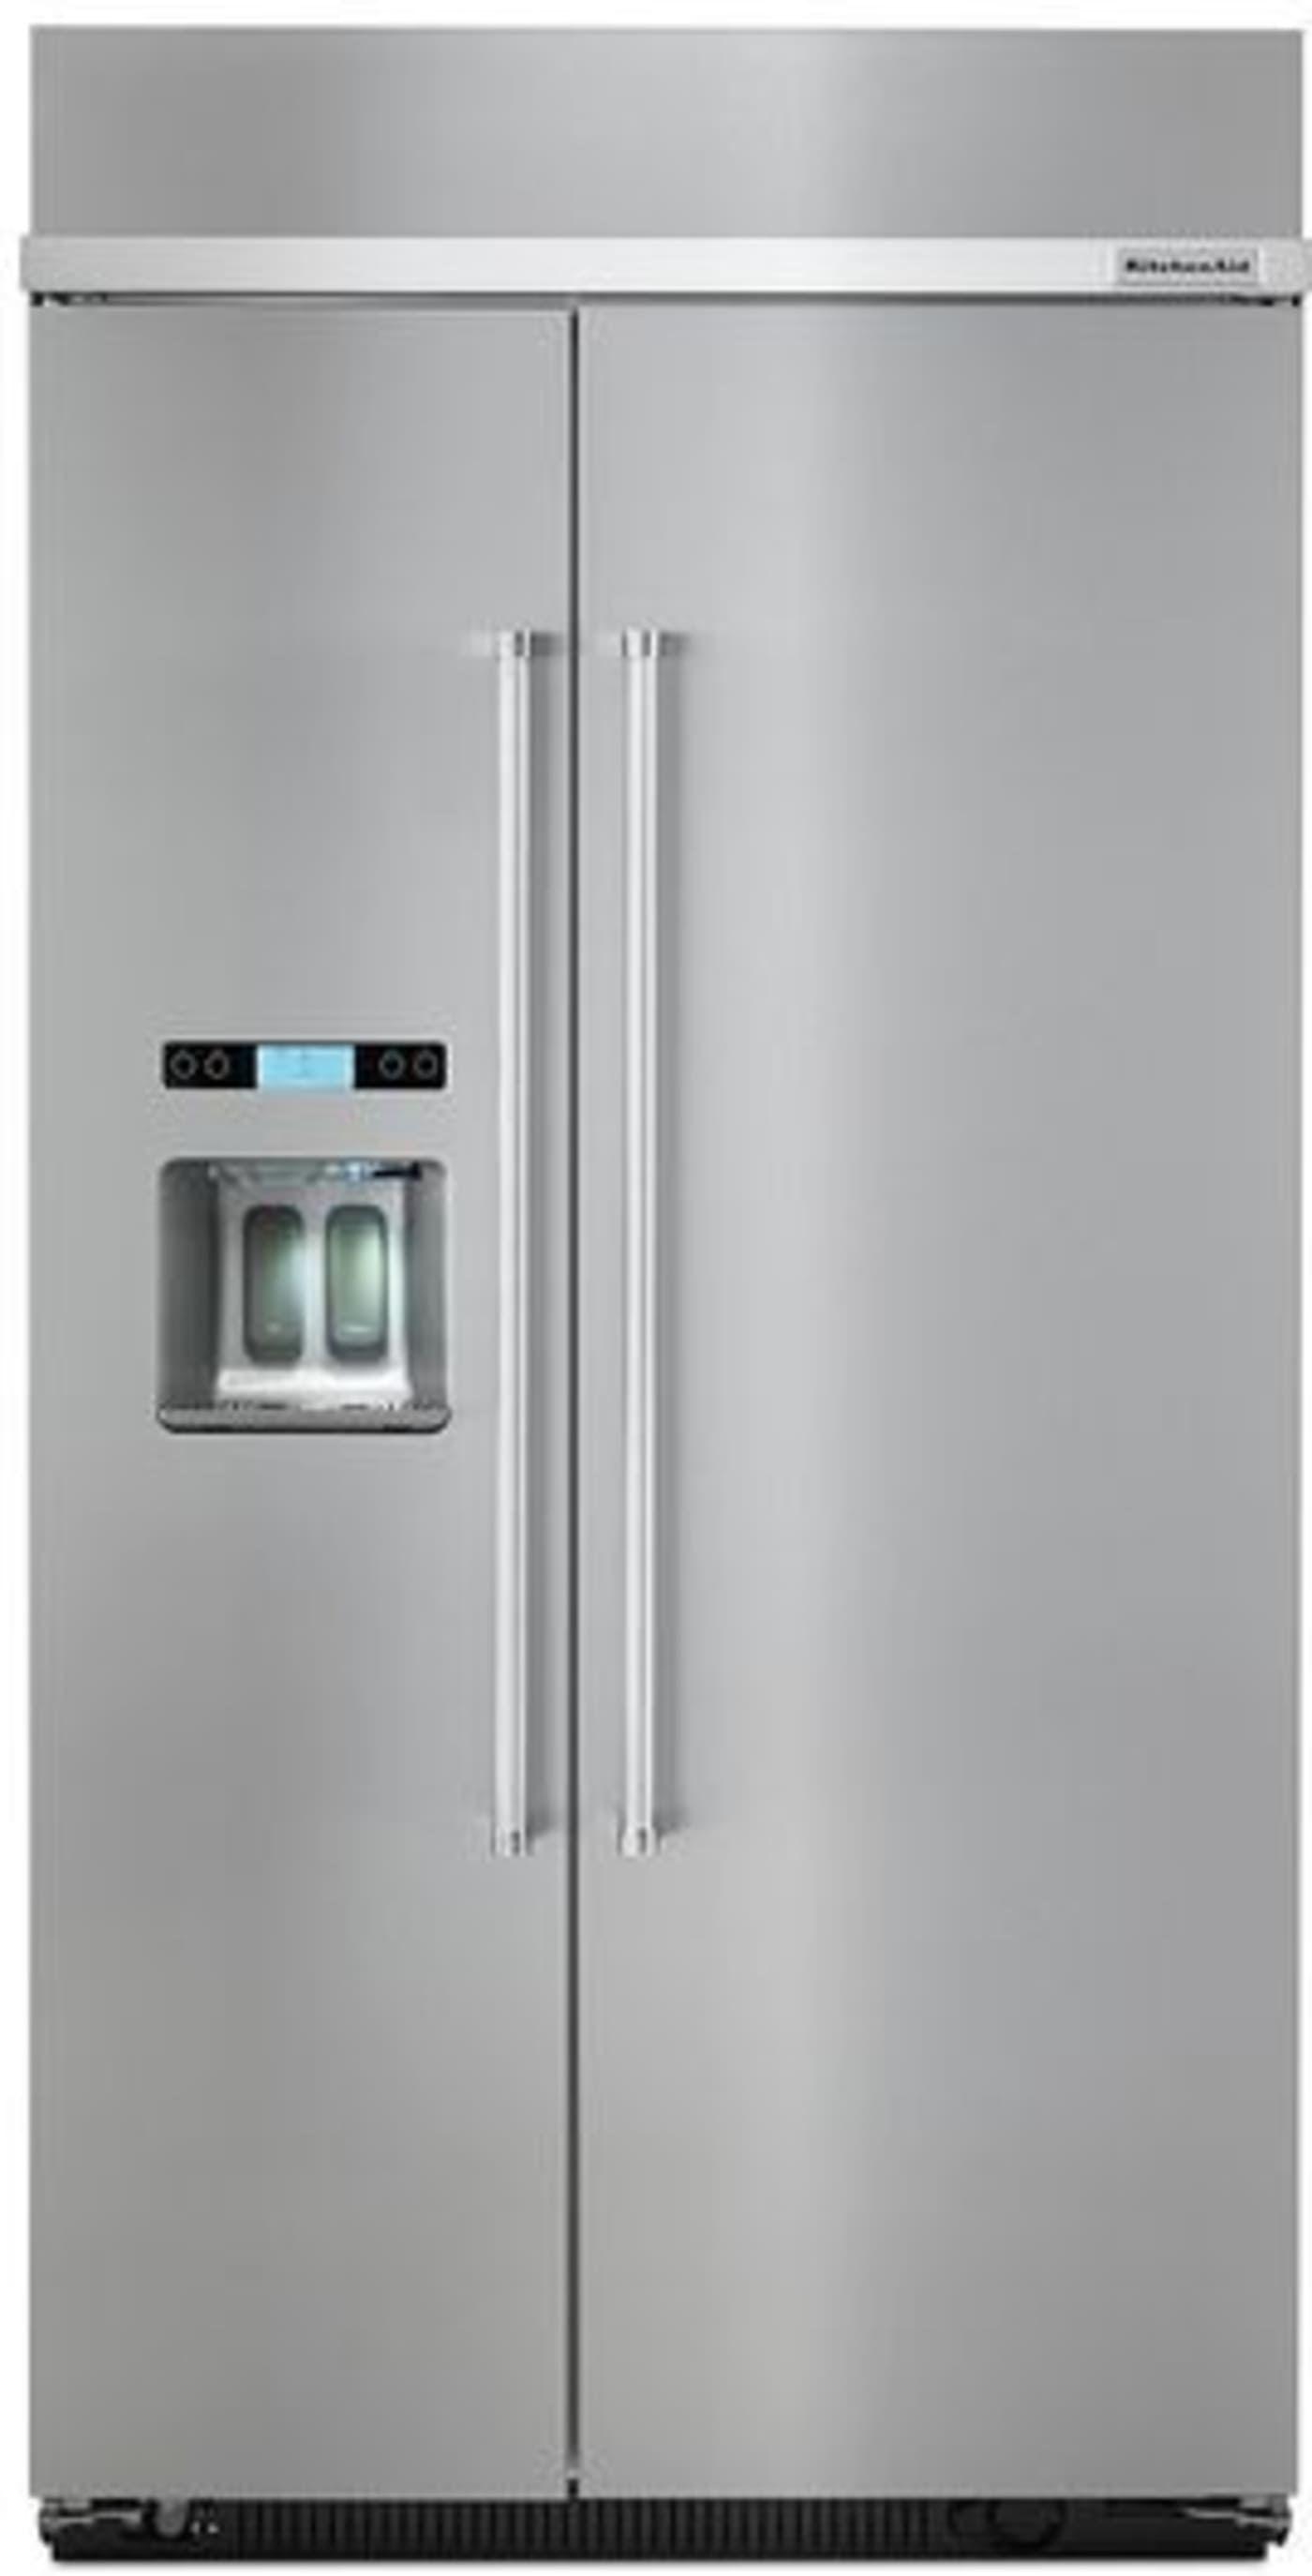 Kbsd612ess by kitchenaid sidebyside refrigerators